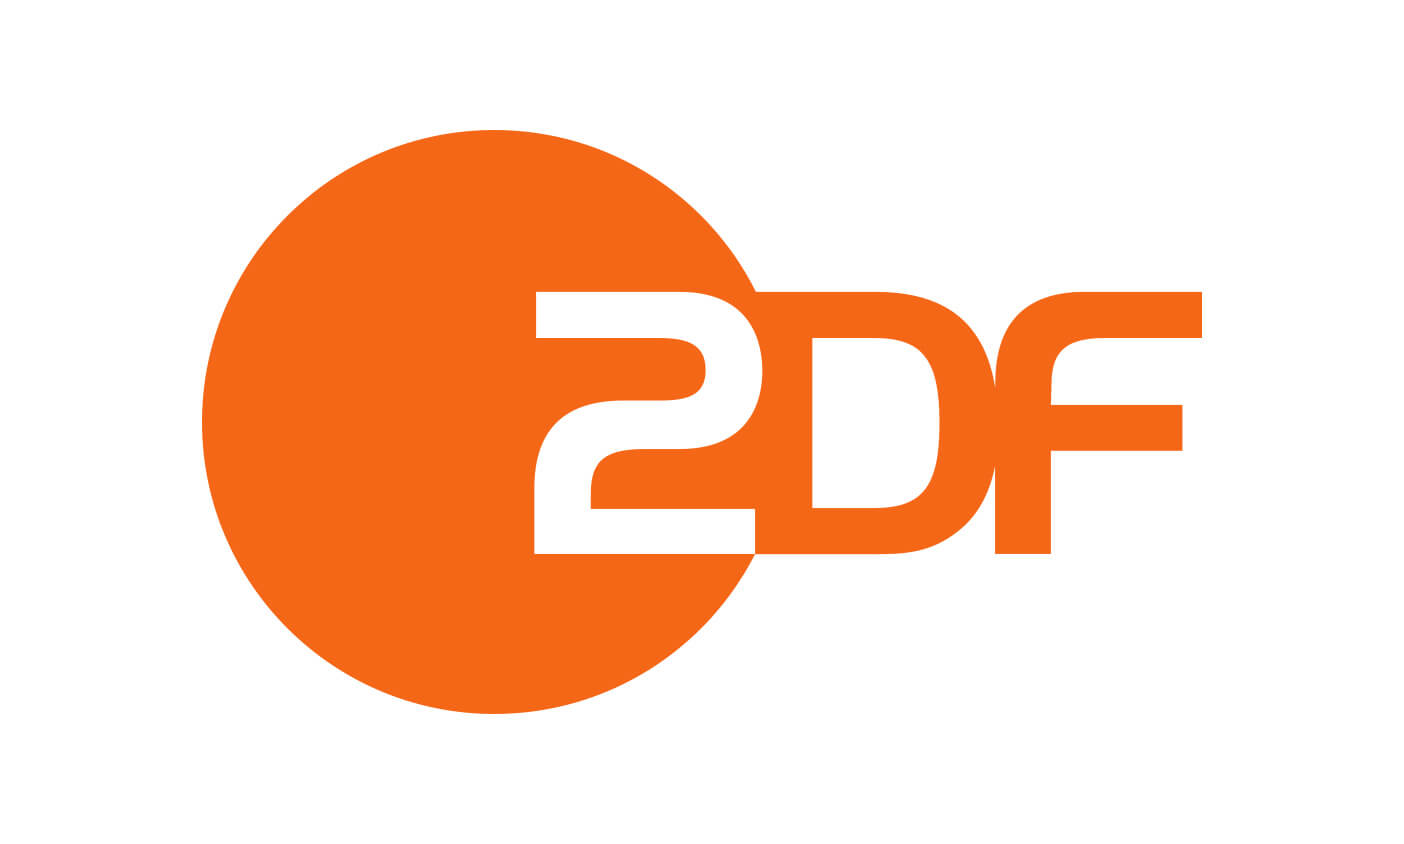 Alles Im Fluss Leben Auf Dem Hausboot Dokumentation ZDFmediathek ZDF Mediathek Short Version